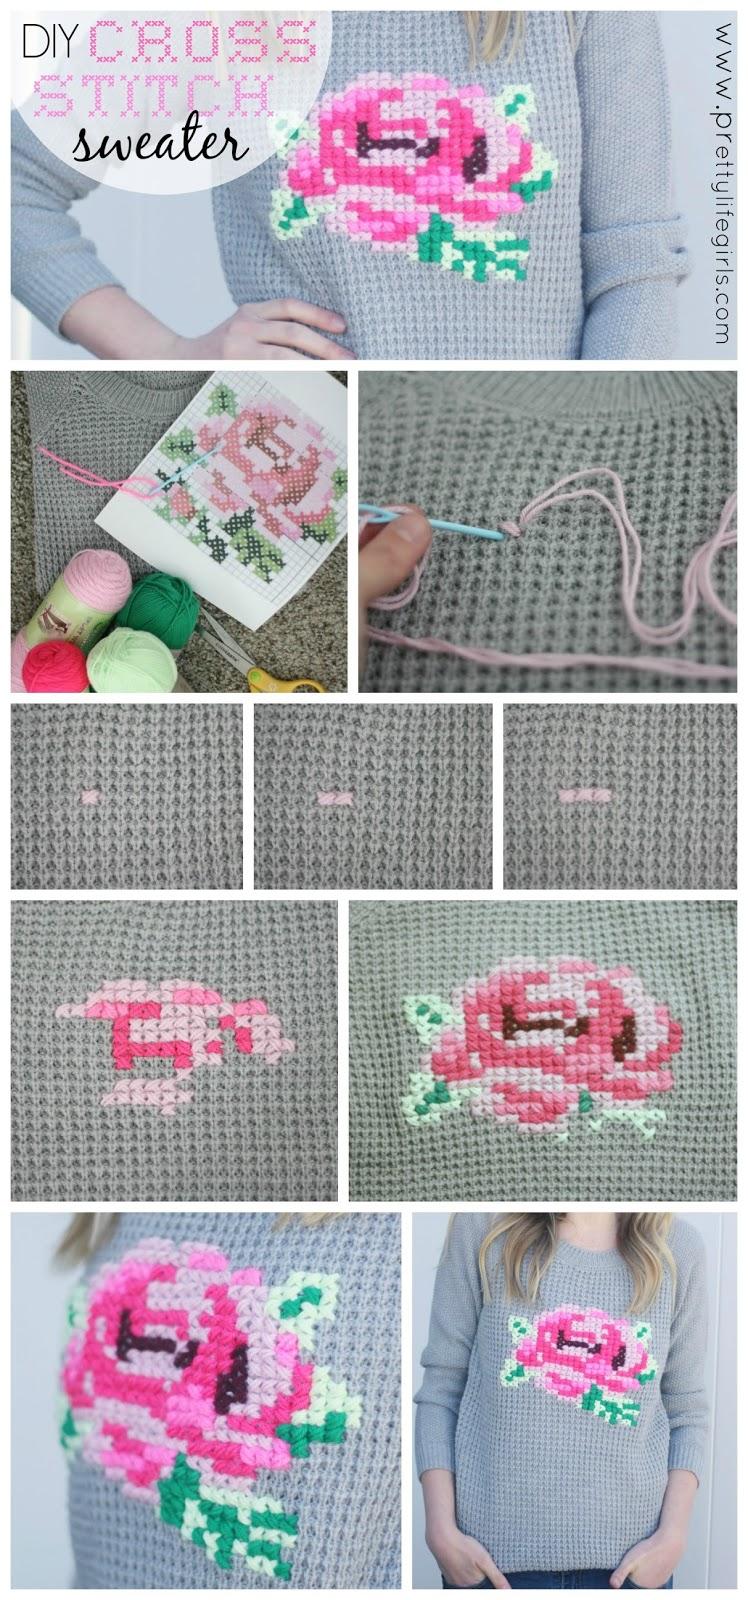 DIY Cross-Stitch Sweater - The Pretty Life Girls